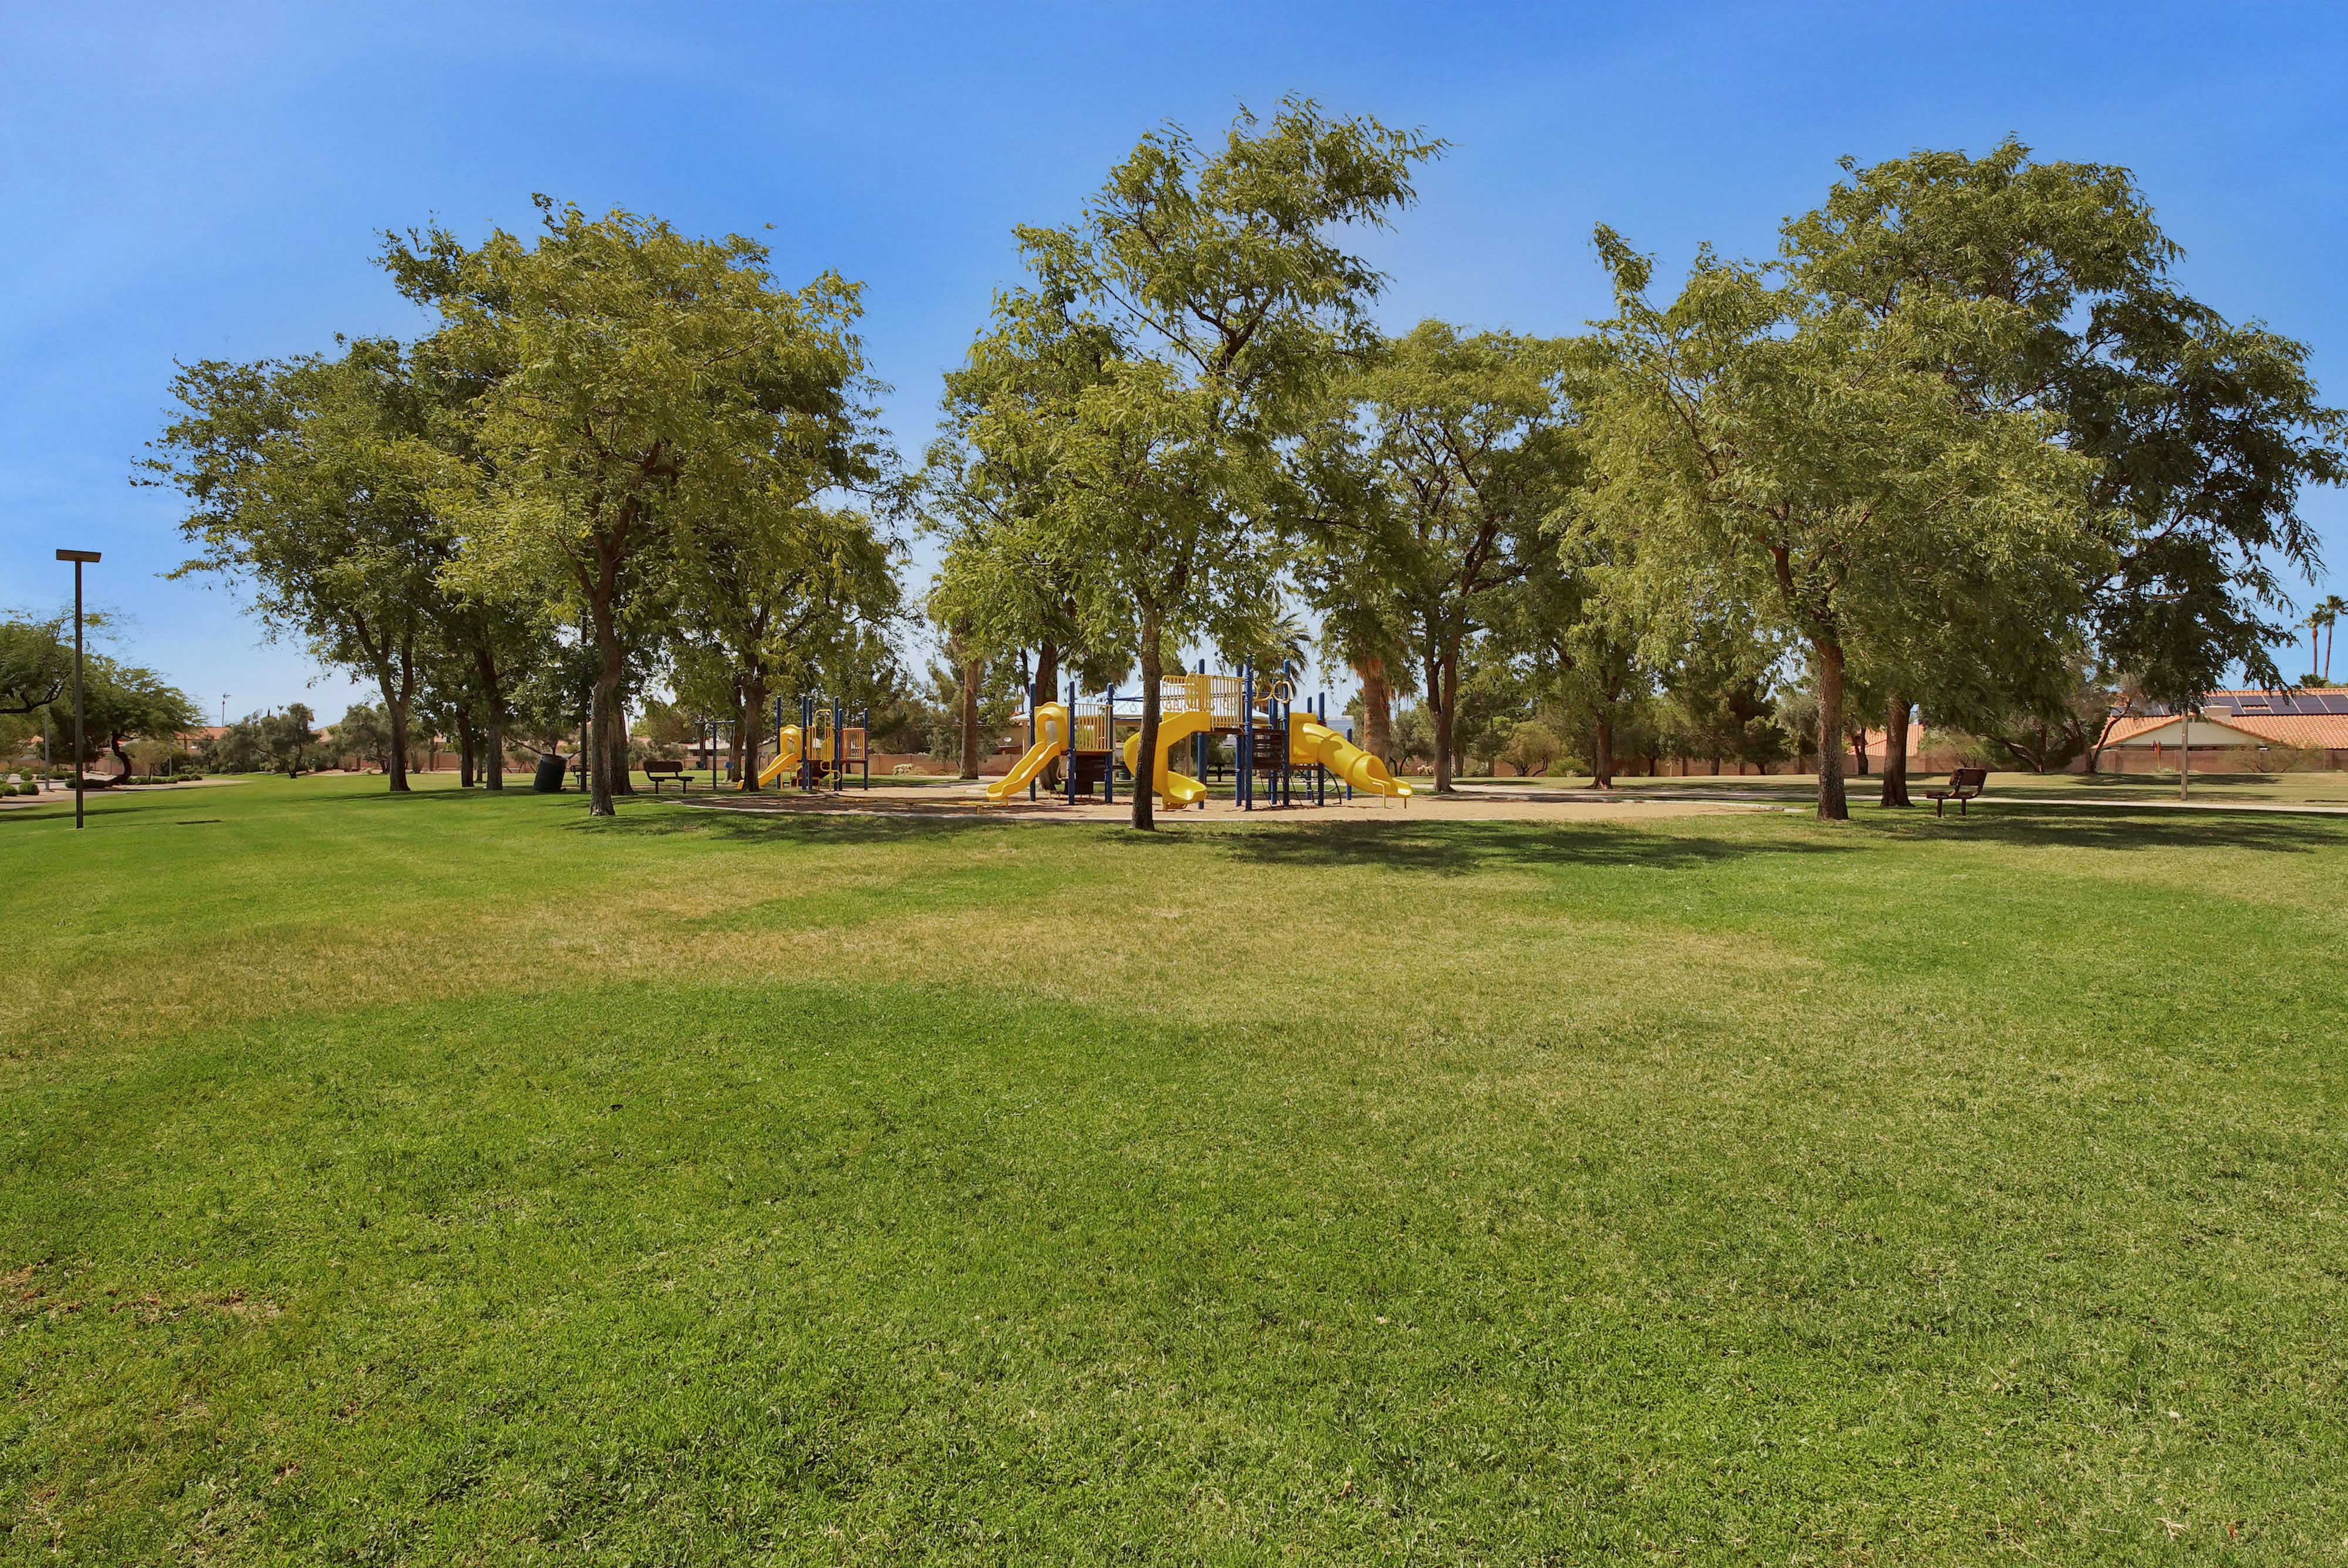 Park In Glendale AZ